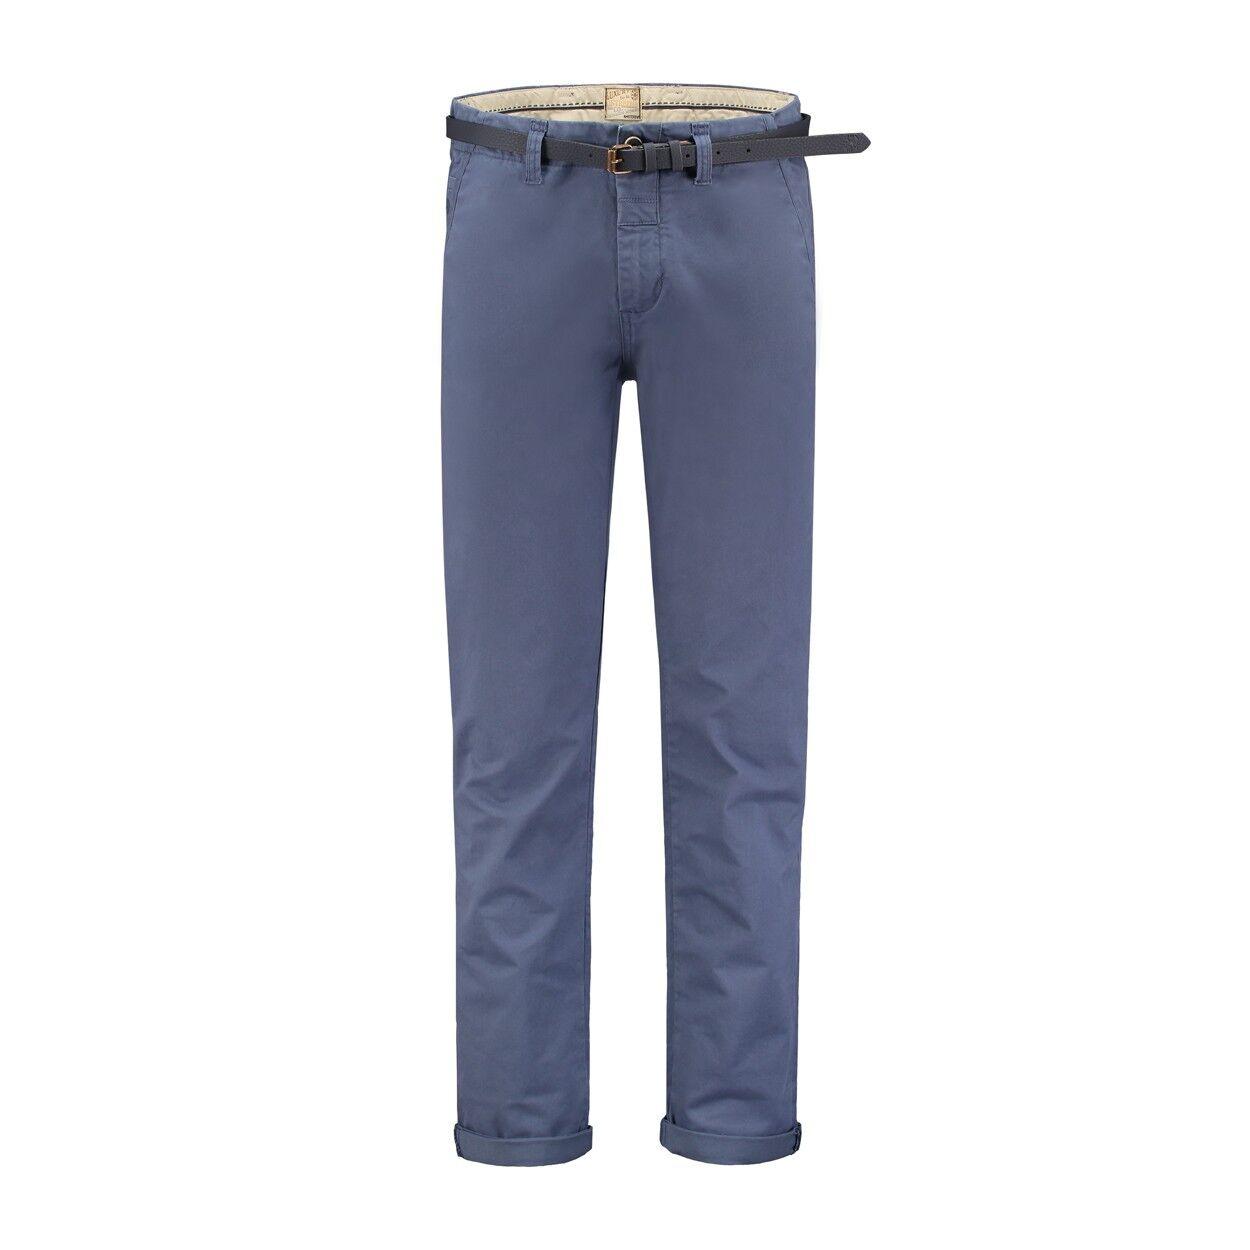 Dstrezzed Chino Pants Stretch Twill Royal Blau